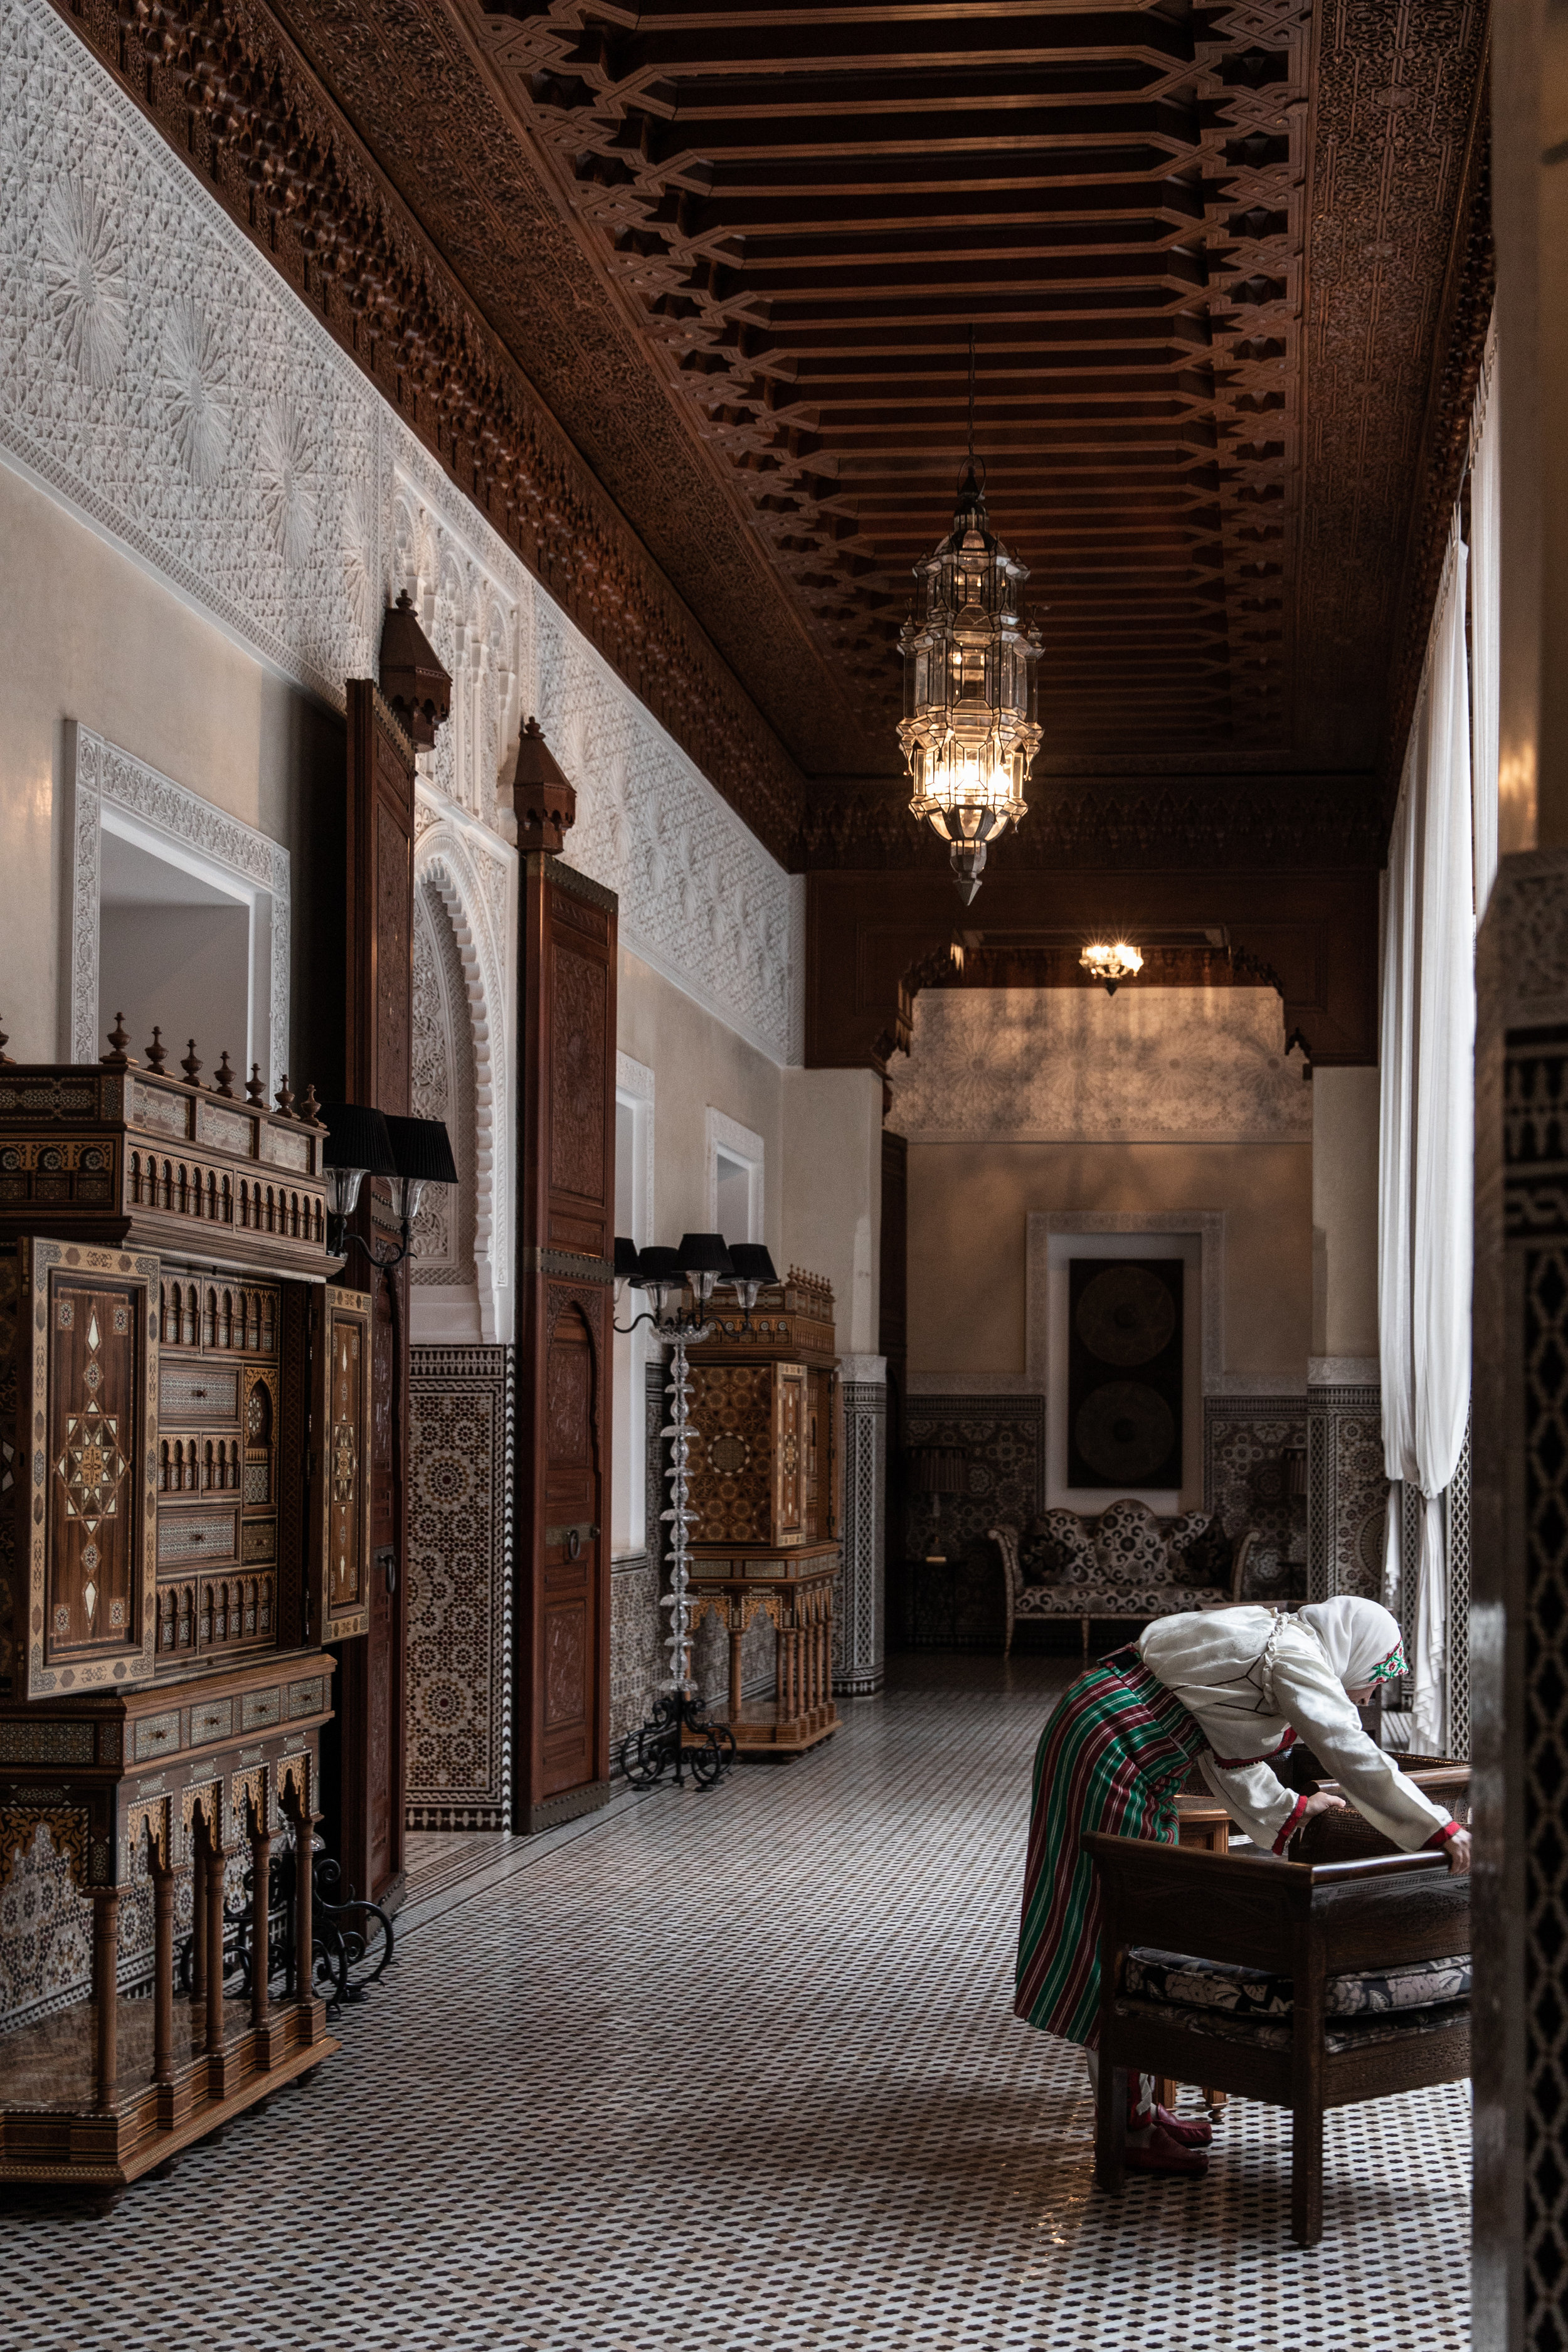 Morocco-3144.jpg